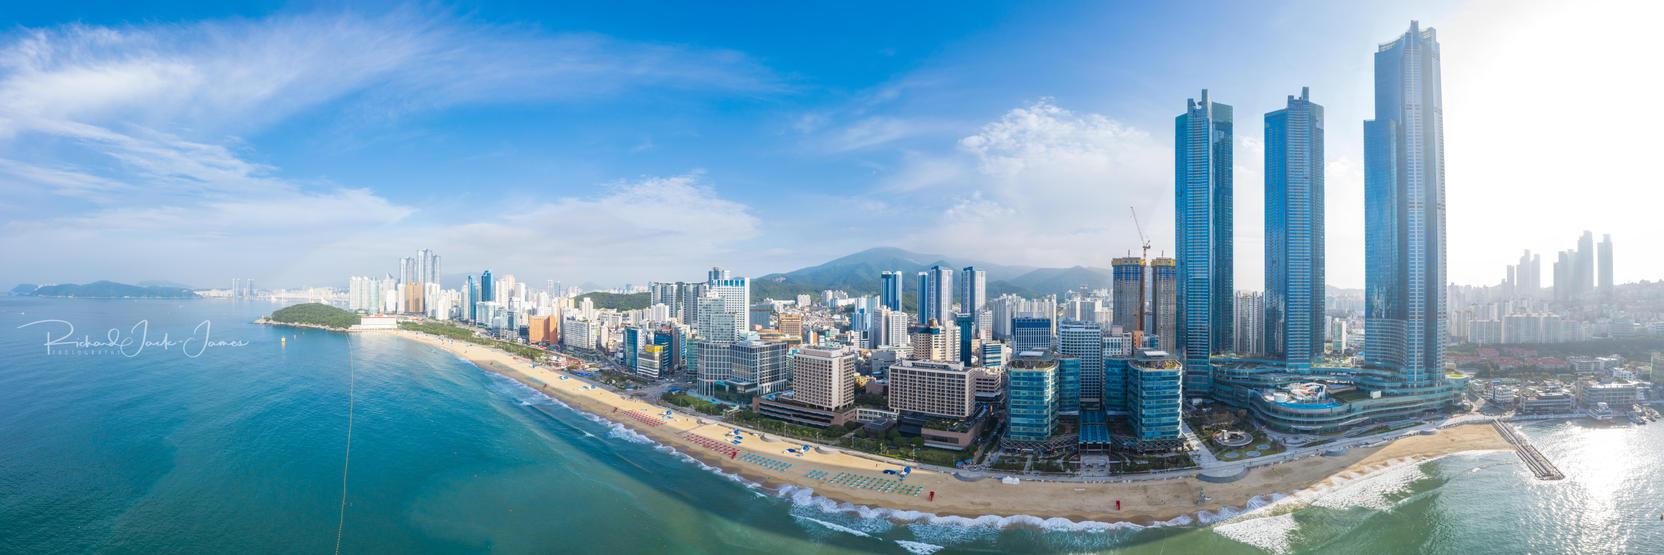 Haeundae Beach Skyline